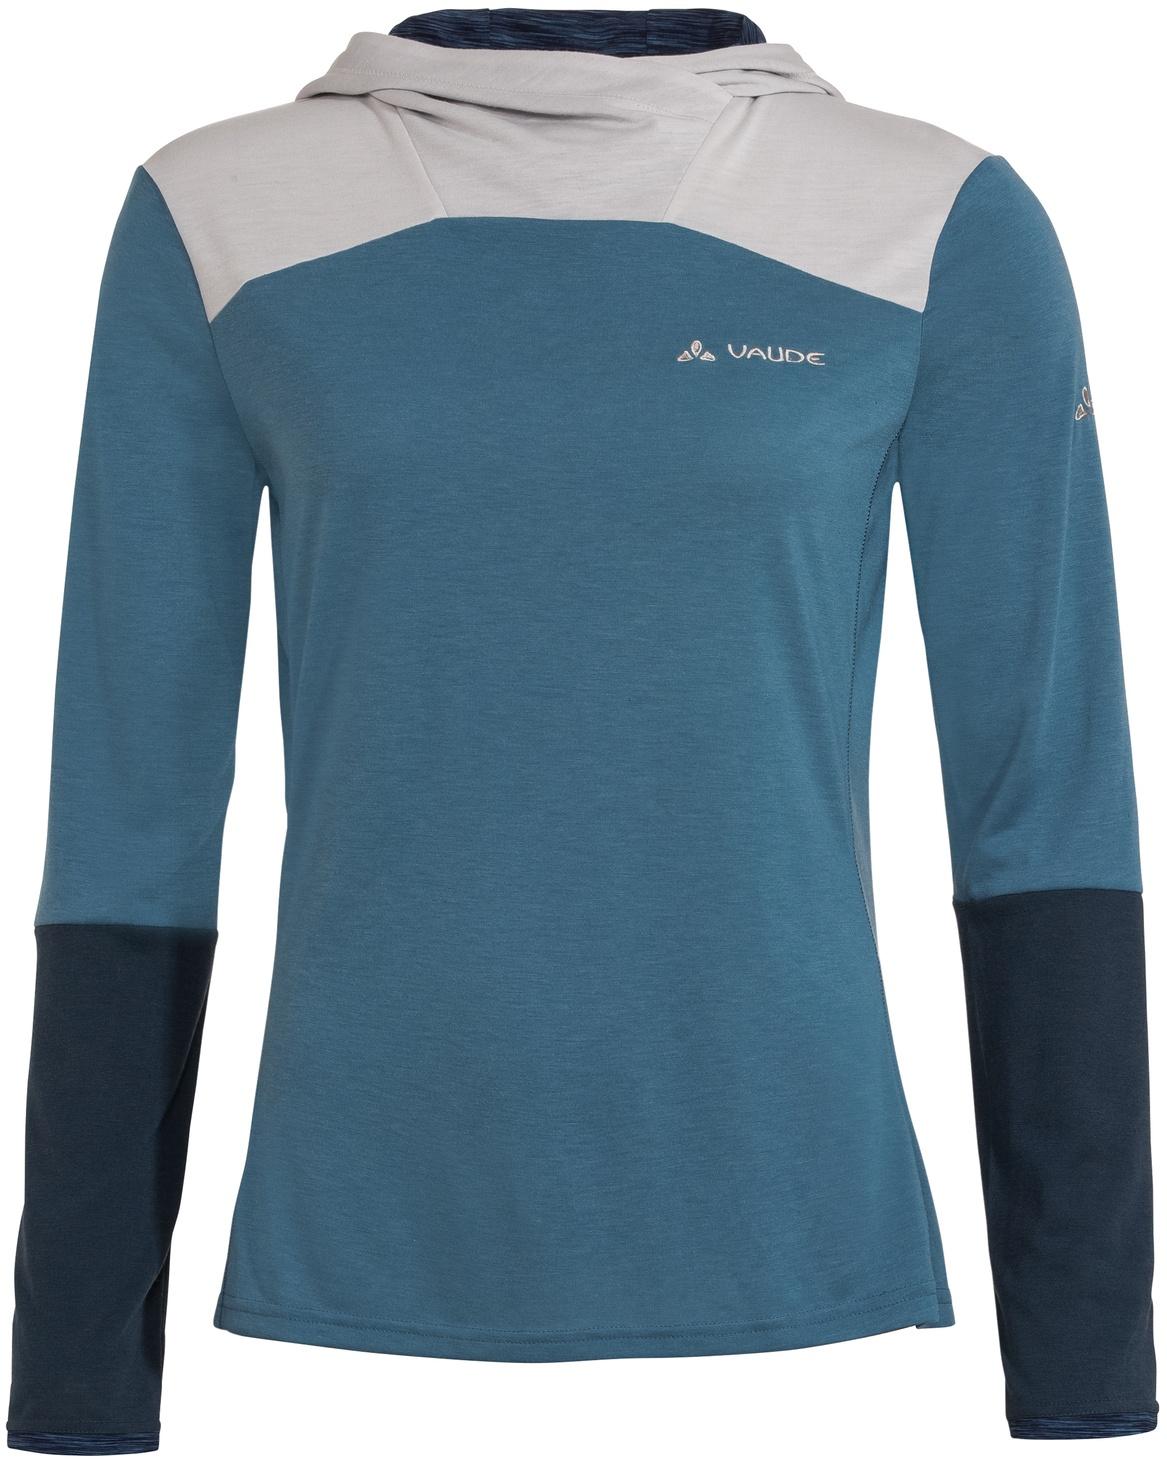 Foto de Vaude Tremalzo Camiseta de manga larga para mujer - blue gray